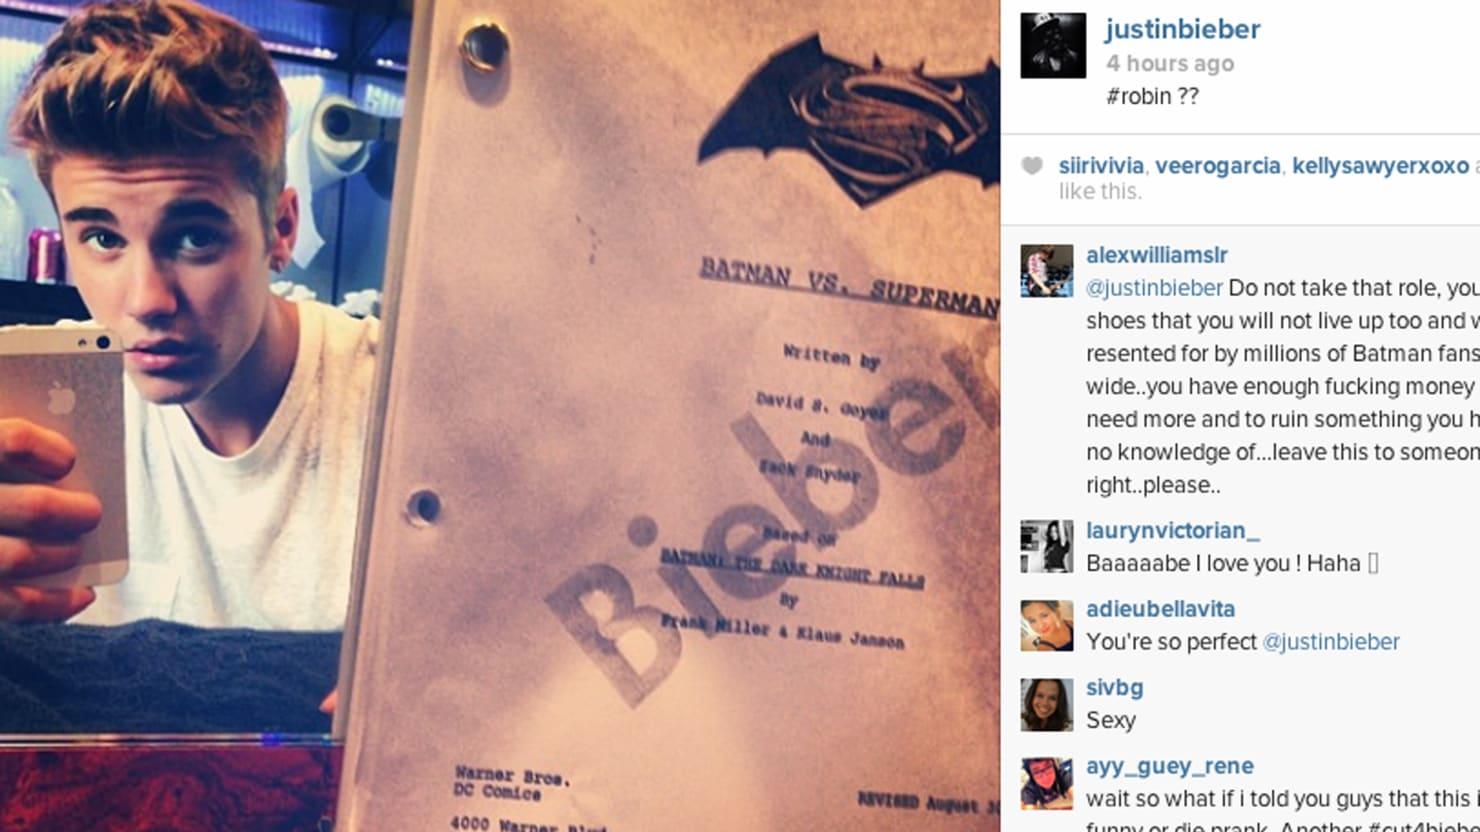 Justin Bieber to Join Ben Affleck in 'Batman vs. Superman'… as Robin?